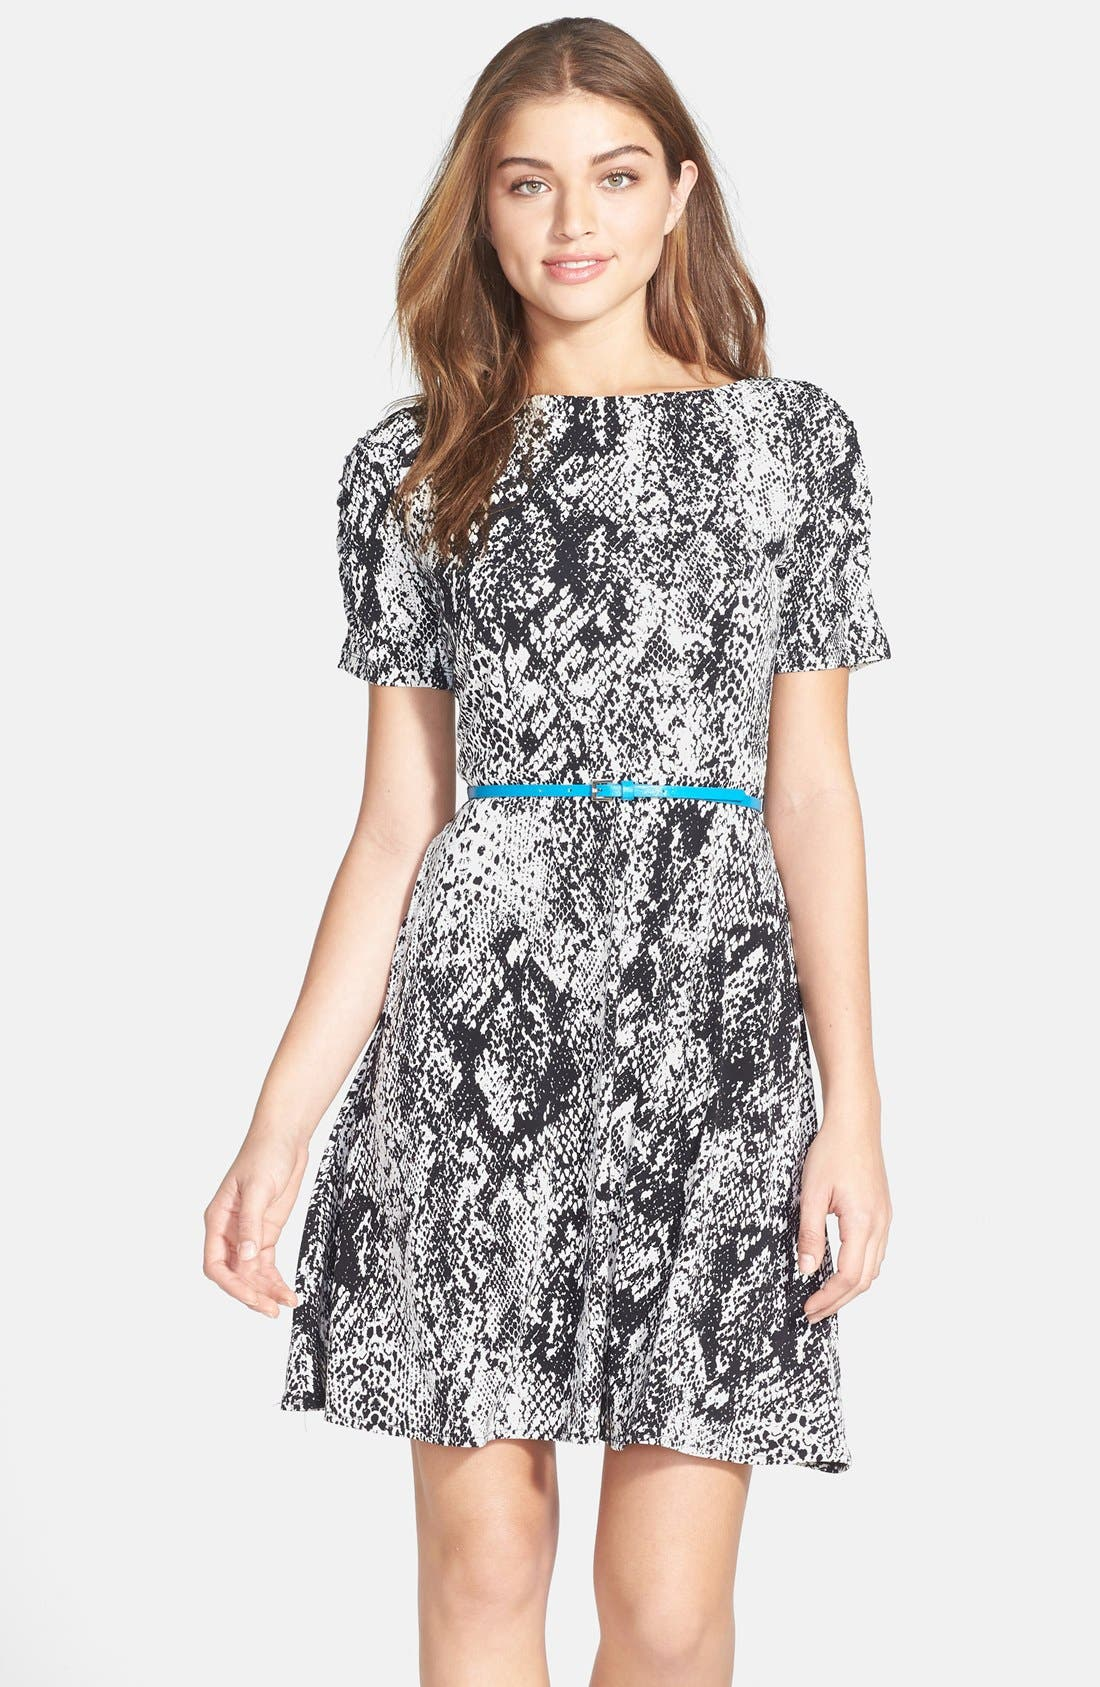 Alternate Image 1 Selected - Donna Morgan Snakeskin Print Jersey Fit & Flare Dress